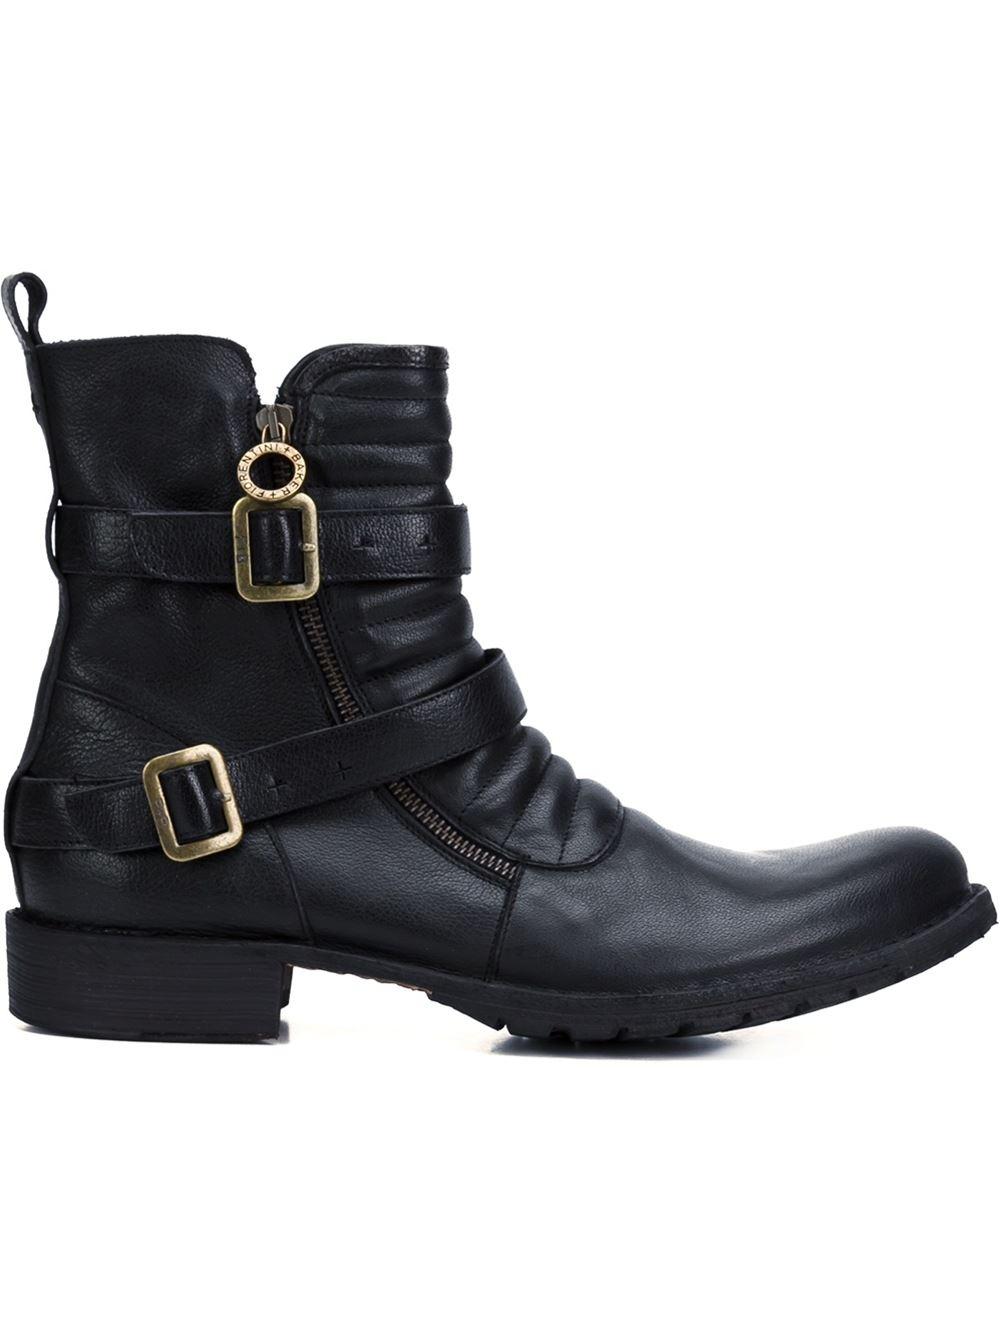 fiorentini baker fiorentini baker eternity boot in. Black Bedroom Furniture Sets. Home Design Ideas